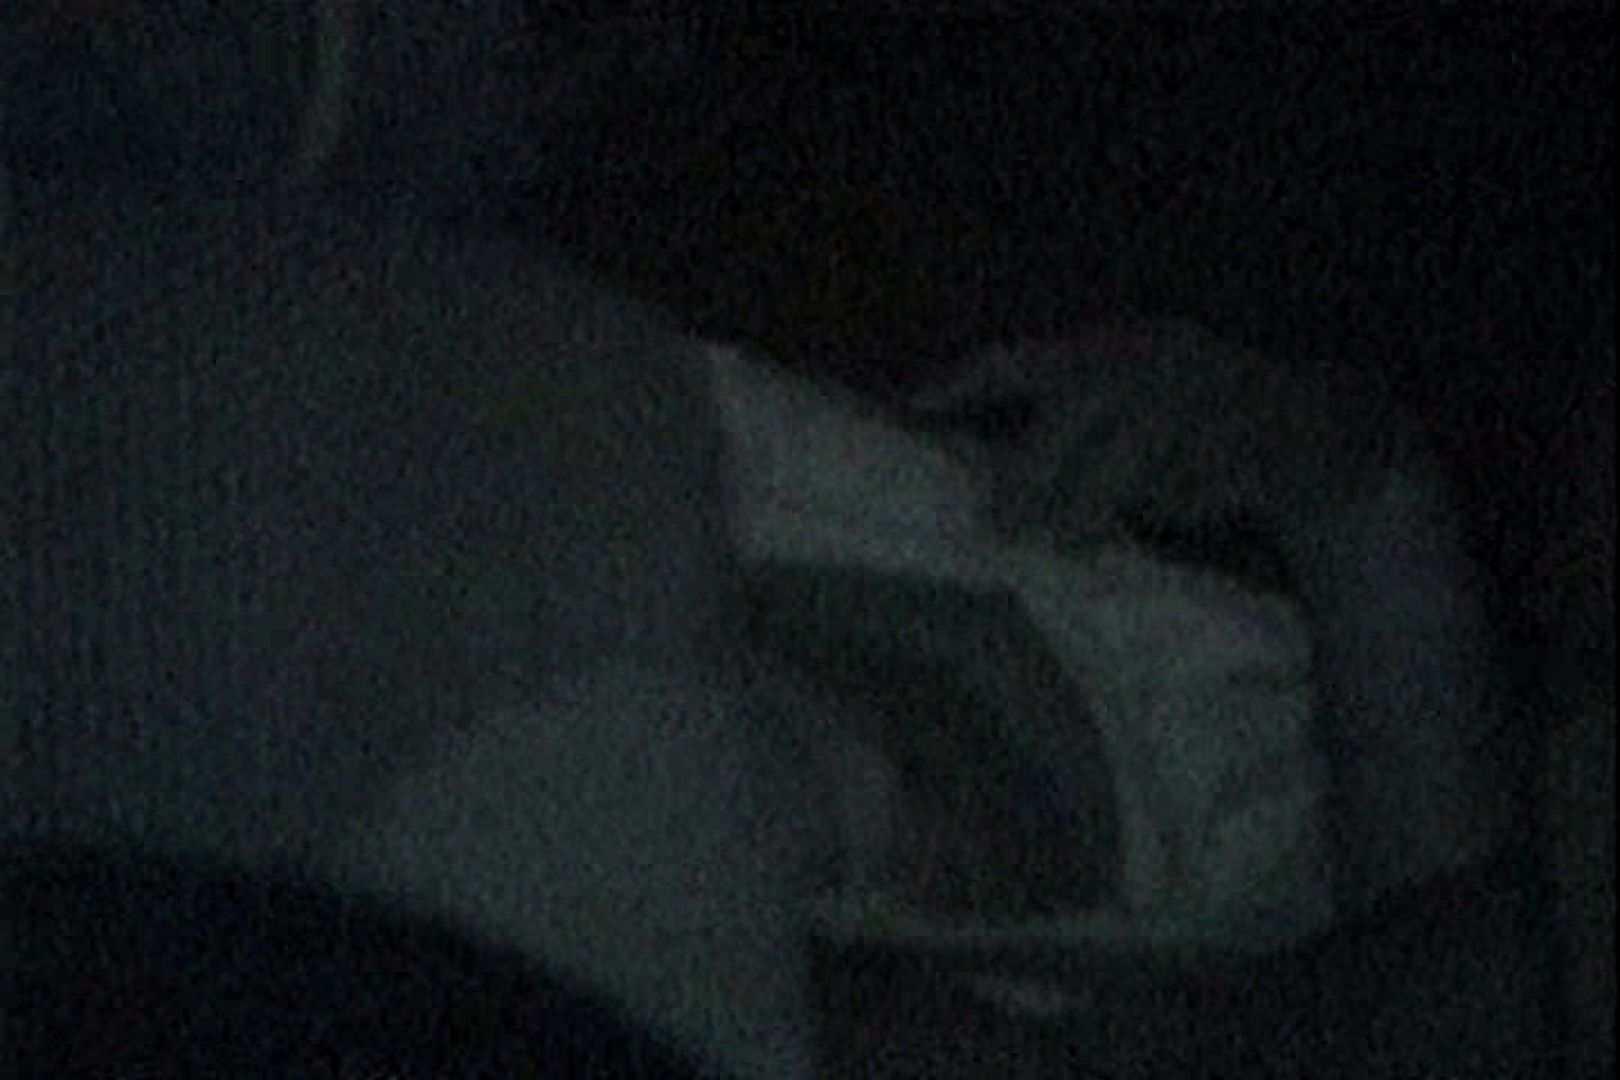 充血監督の深夜の運動会Vol.144 車 戯れ無修正画像 100画像 75